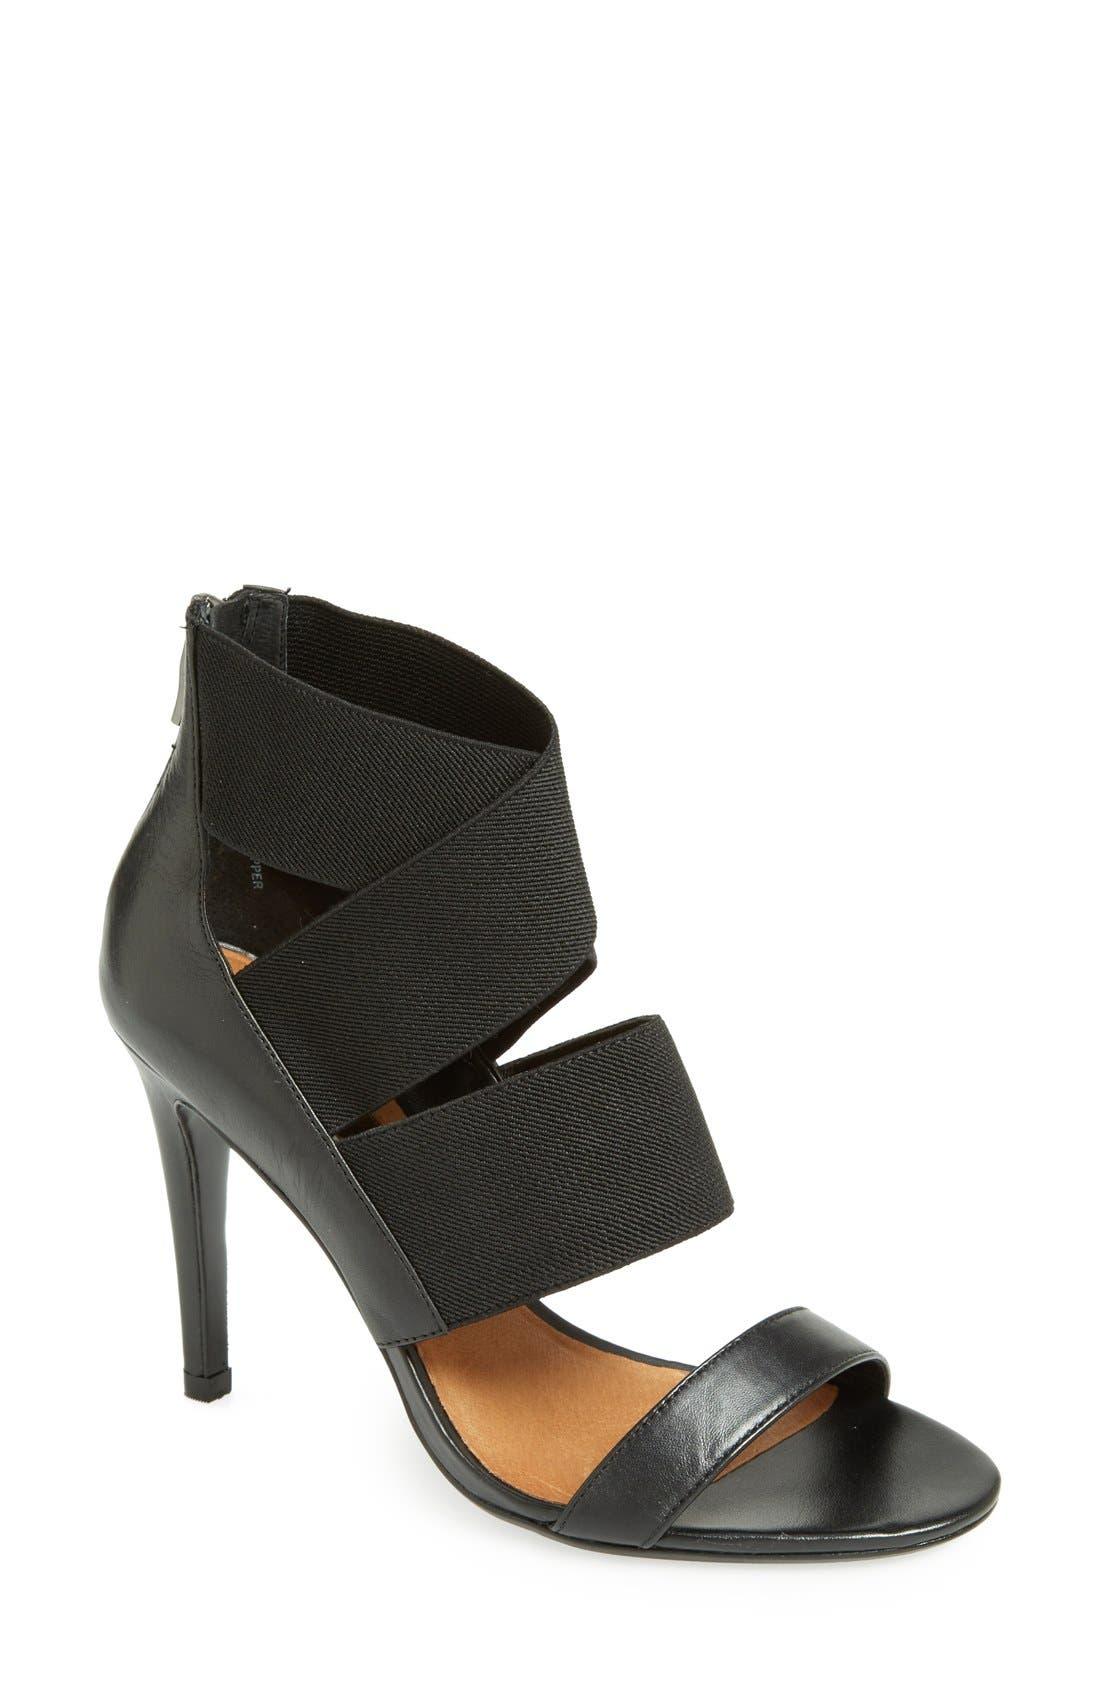 Main Image - Halogen® 'Katy' Sandal (Women)